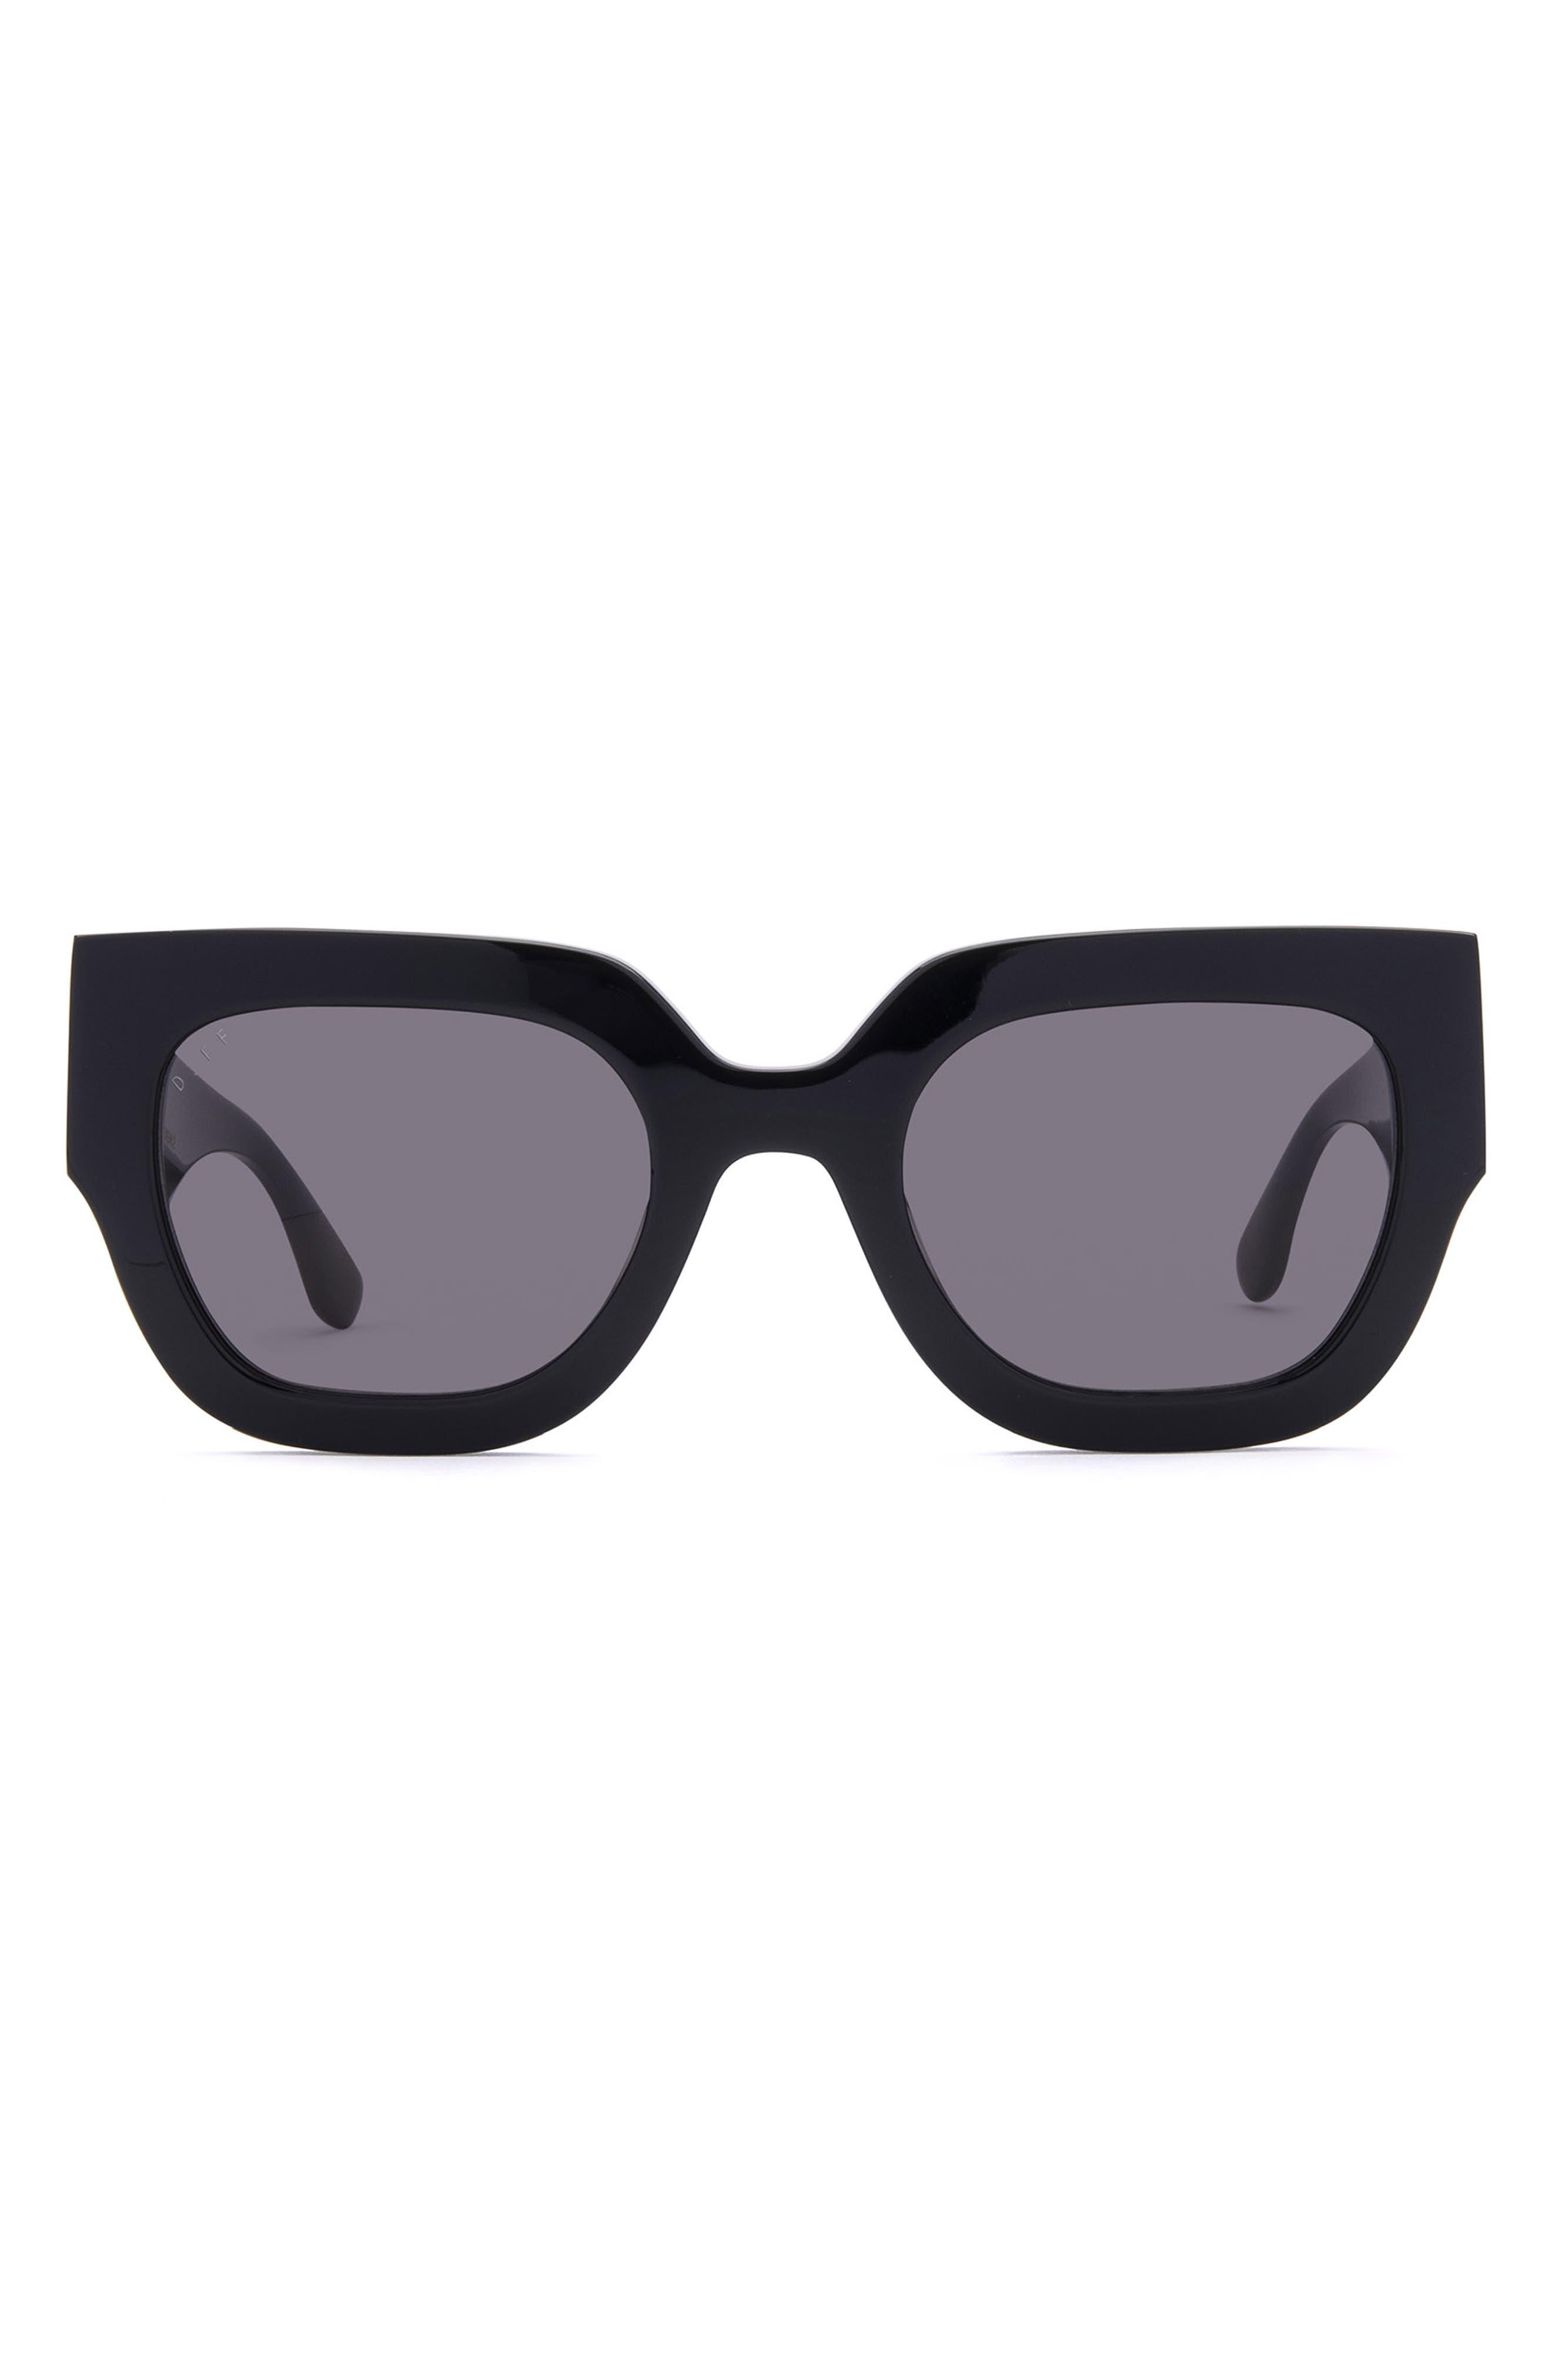 51mm Arden Flat Top Sunglasses